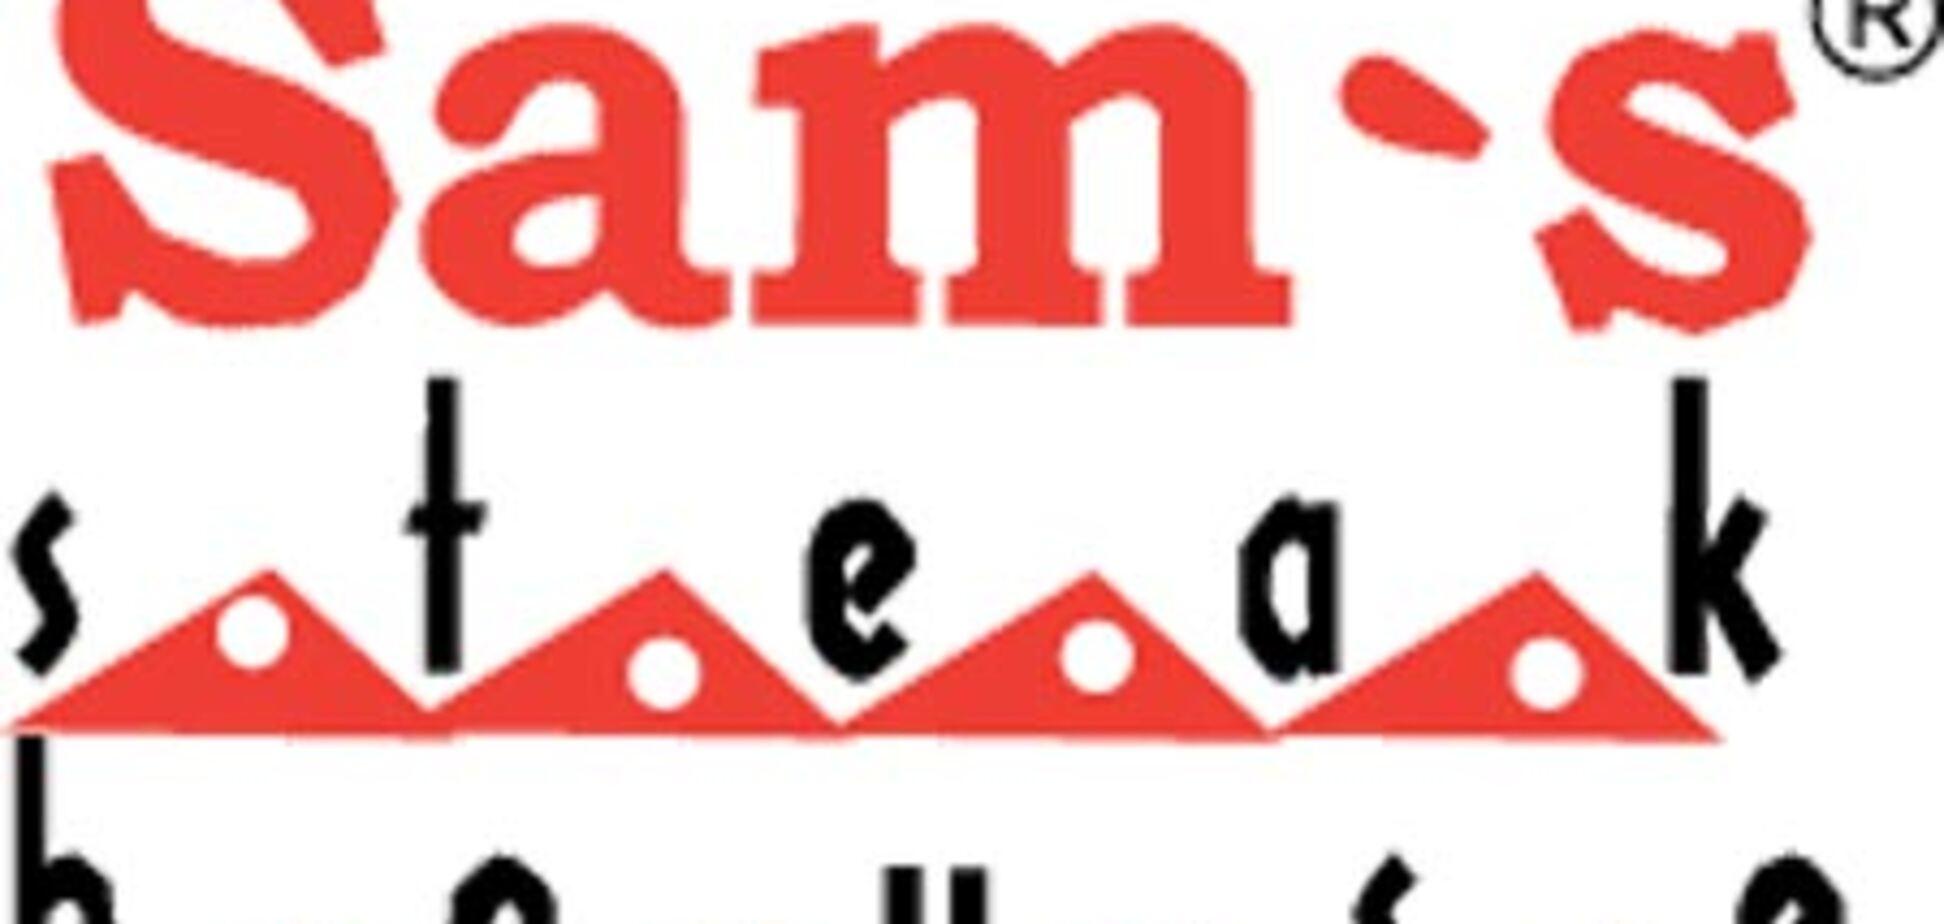 Sam`s steak house